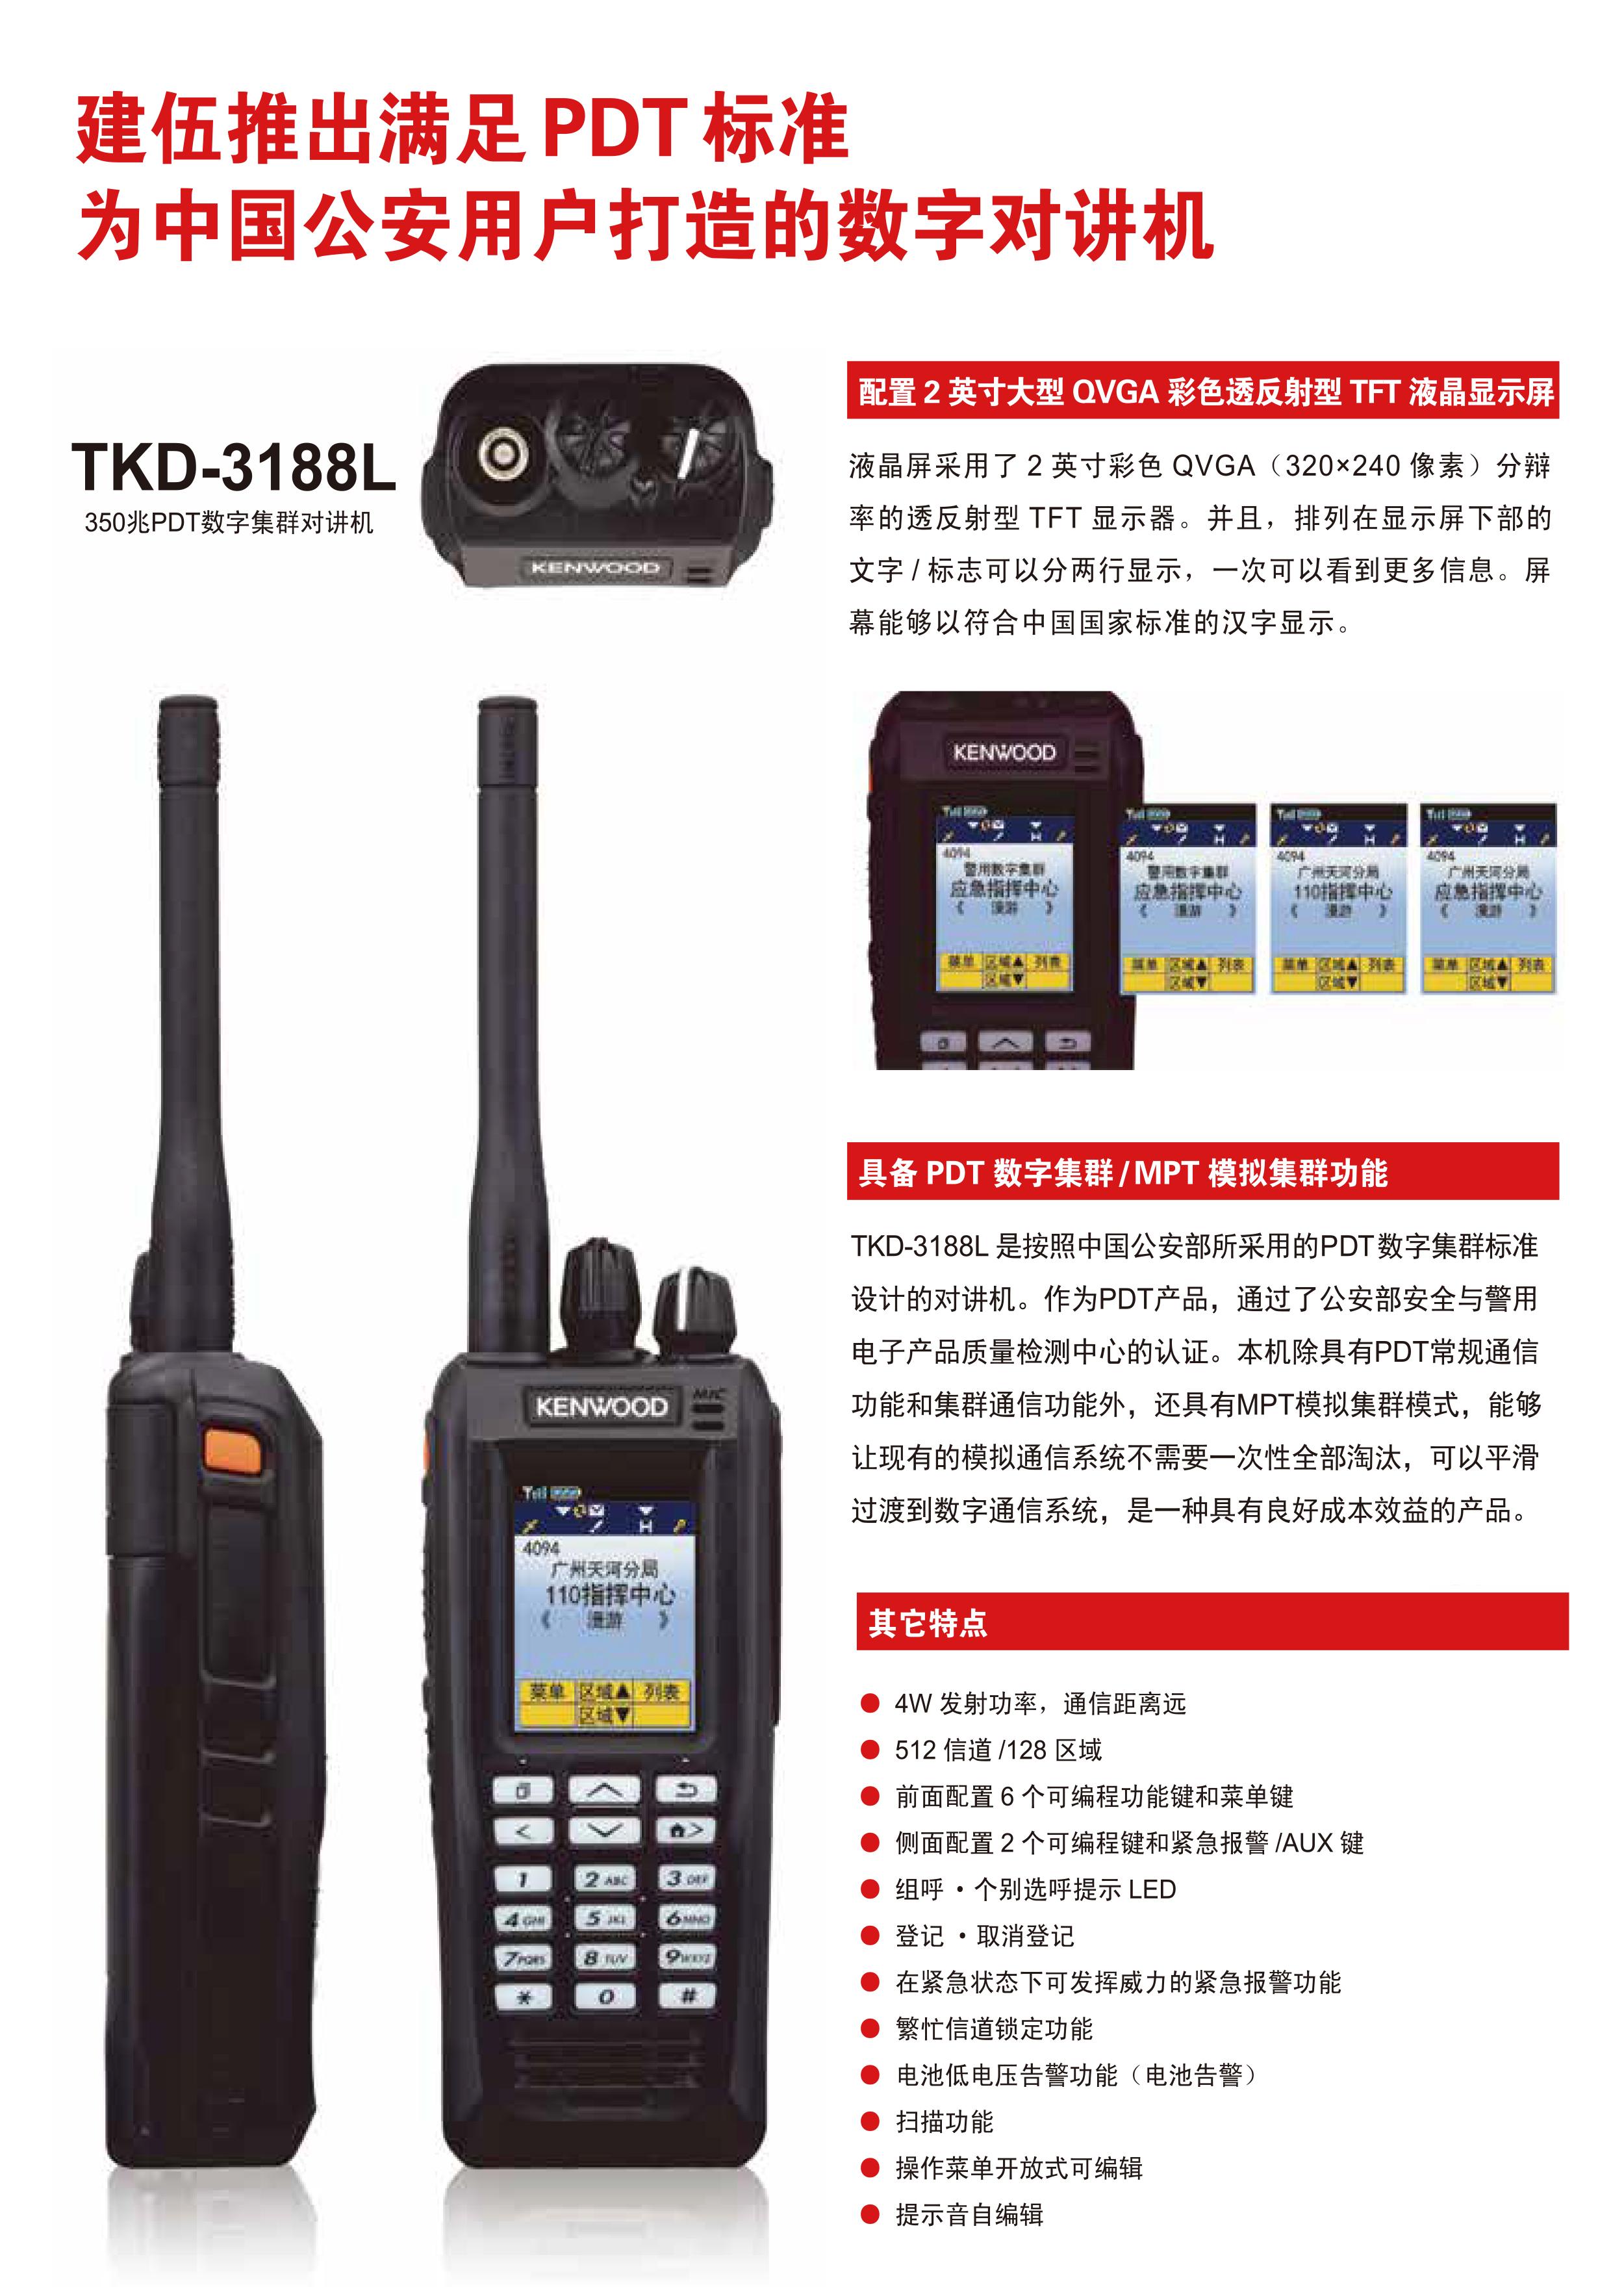 TKD-3188L数字对讲机彩页_02